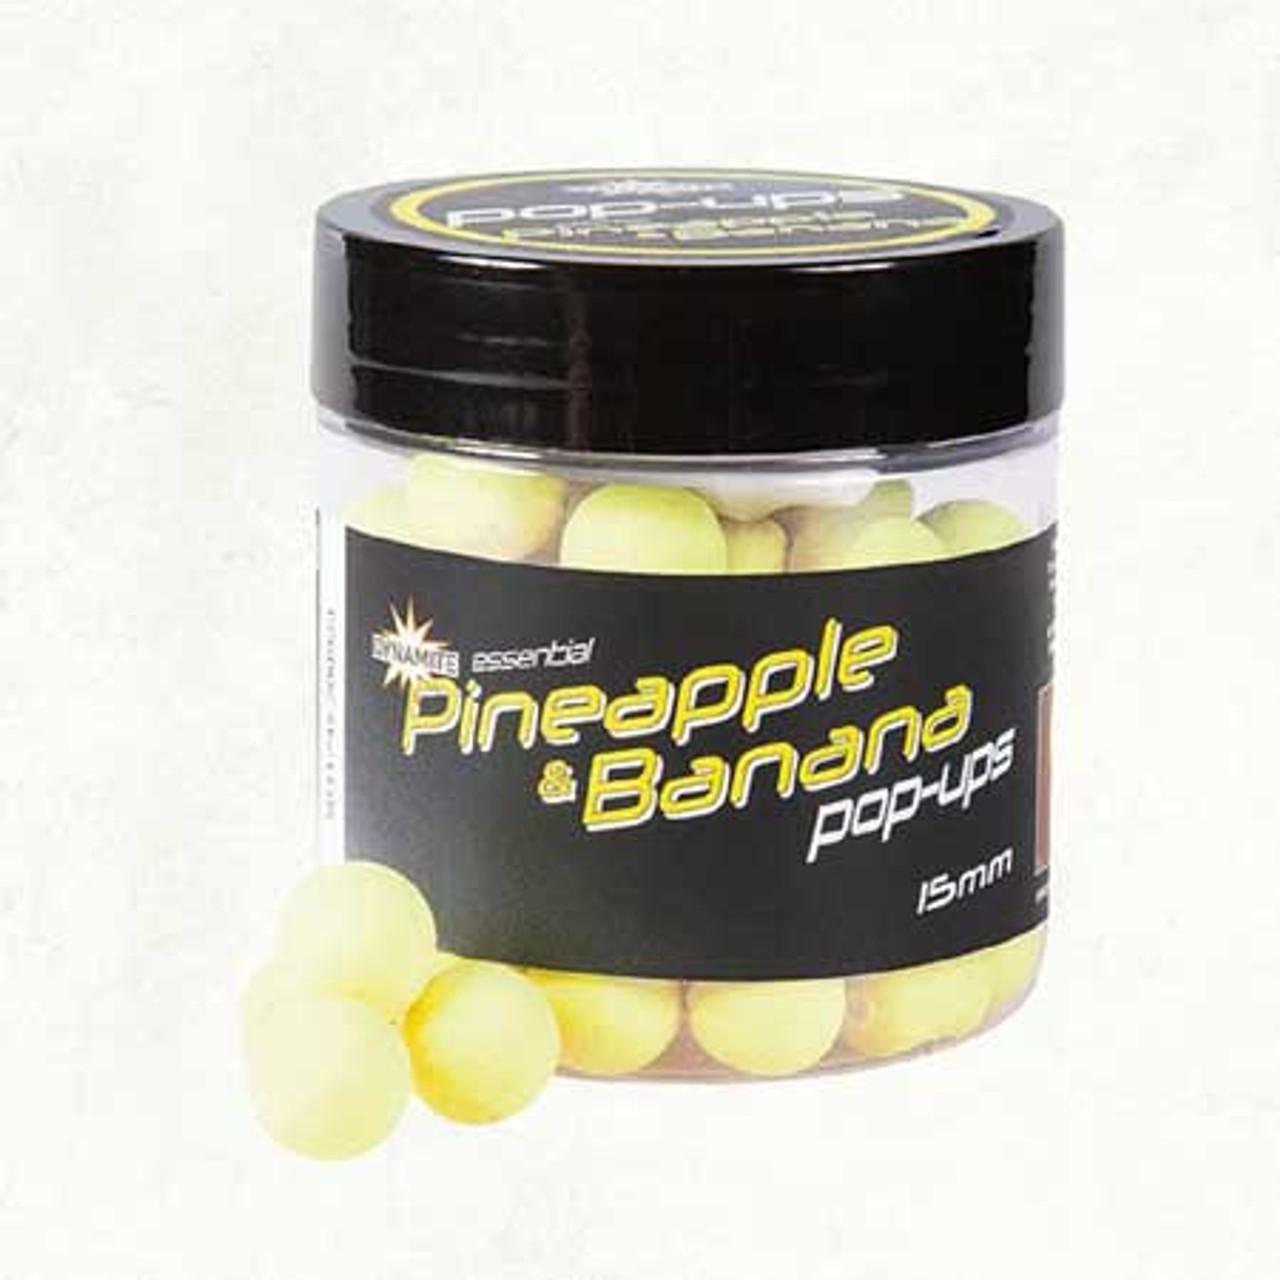 Dynamite Baits Essential Fluro Pineapple & Banana Fluro Pop-ups